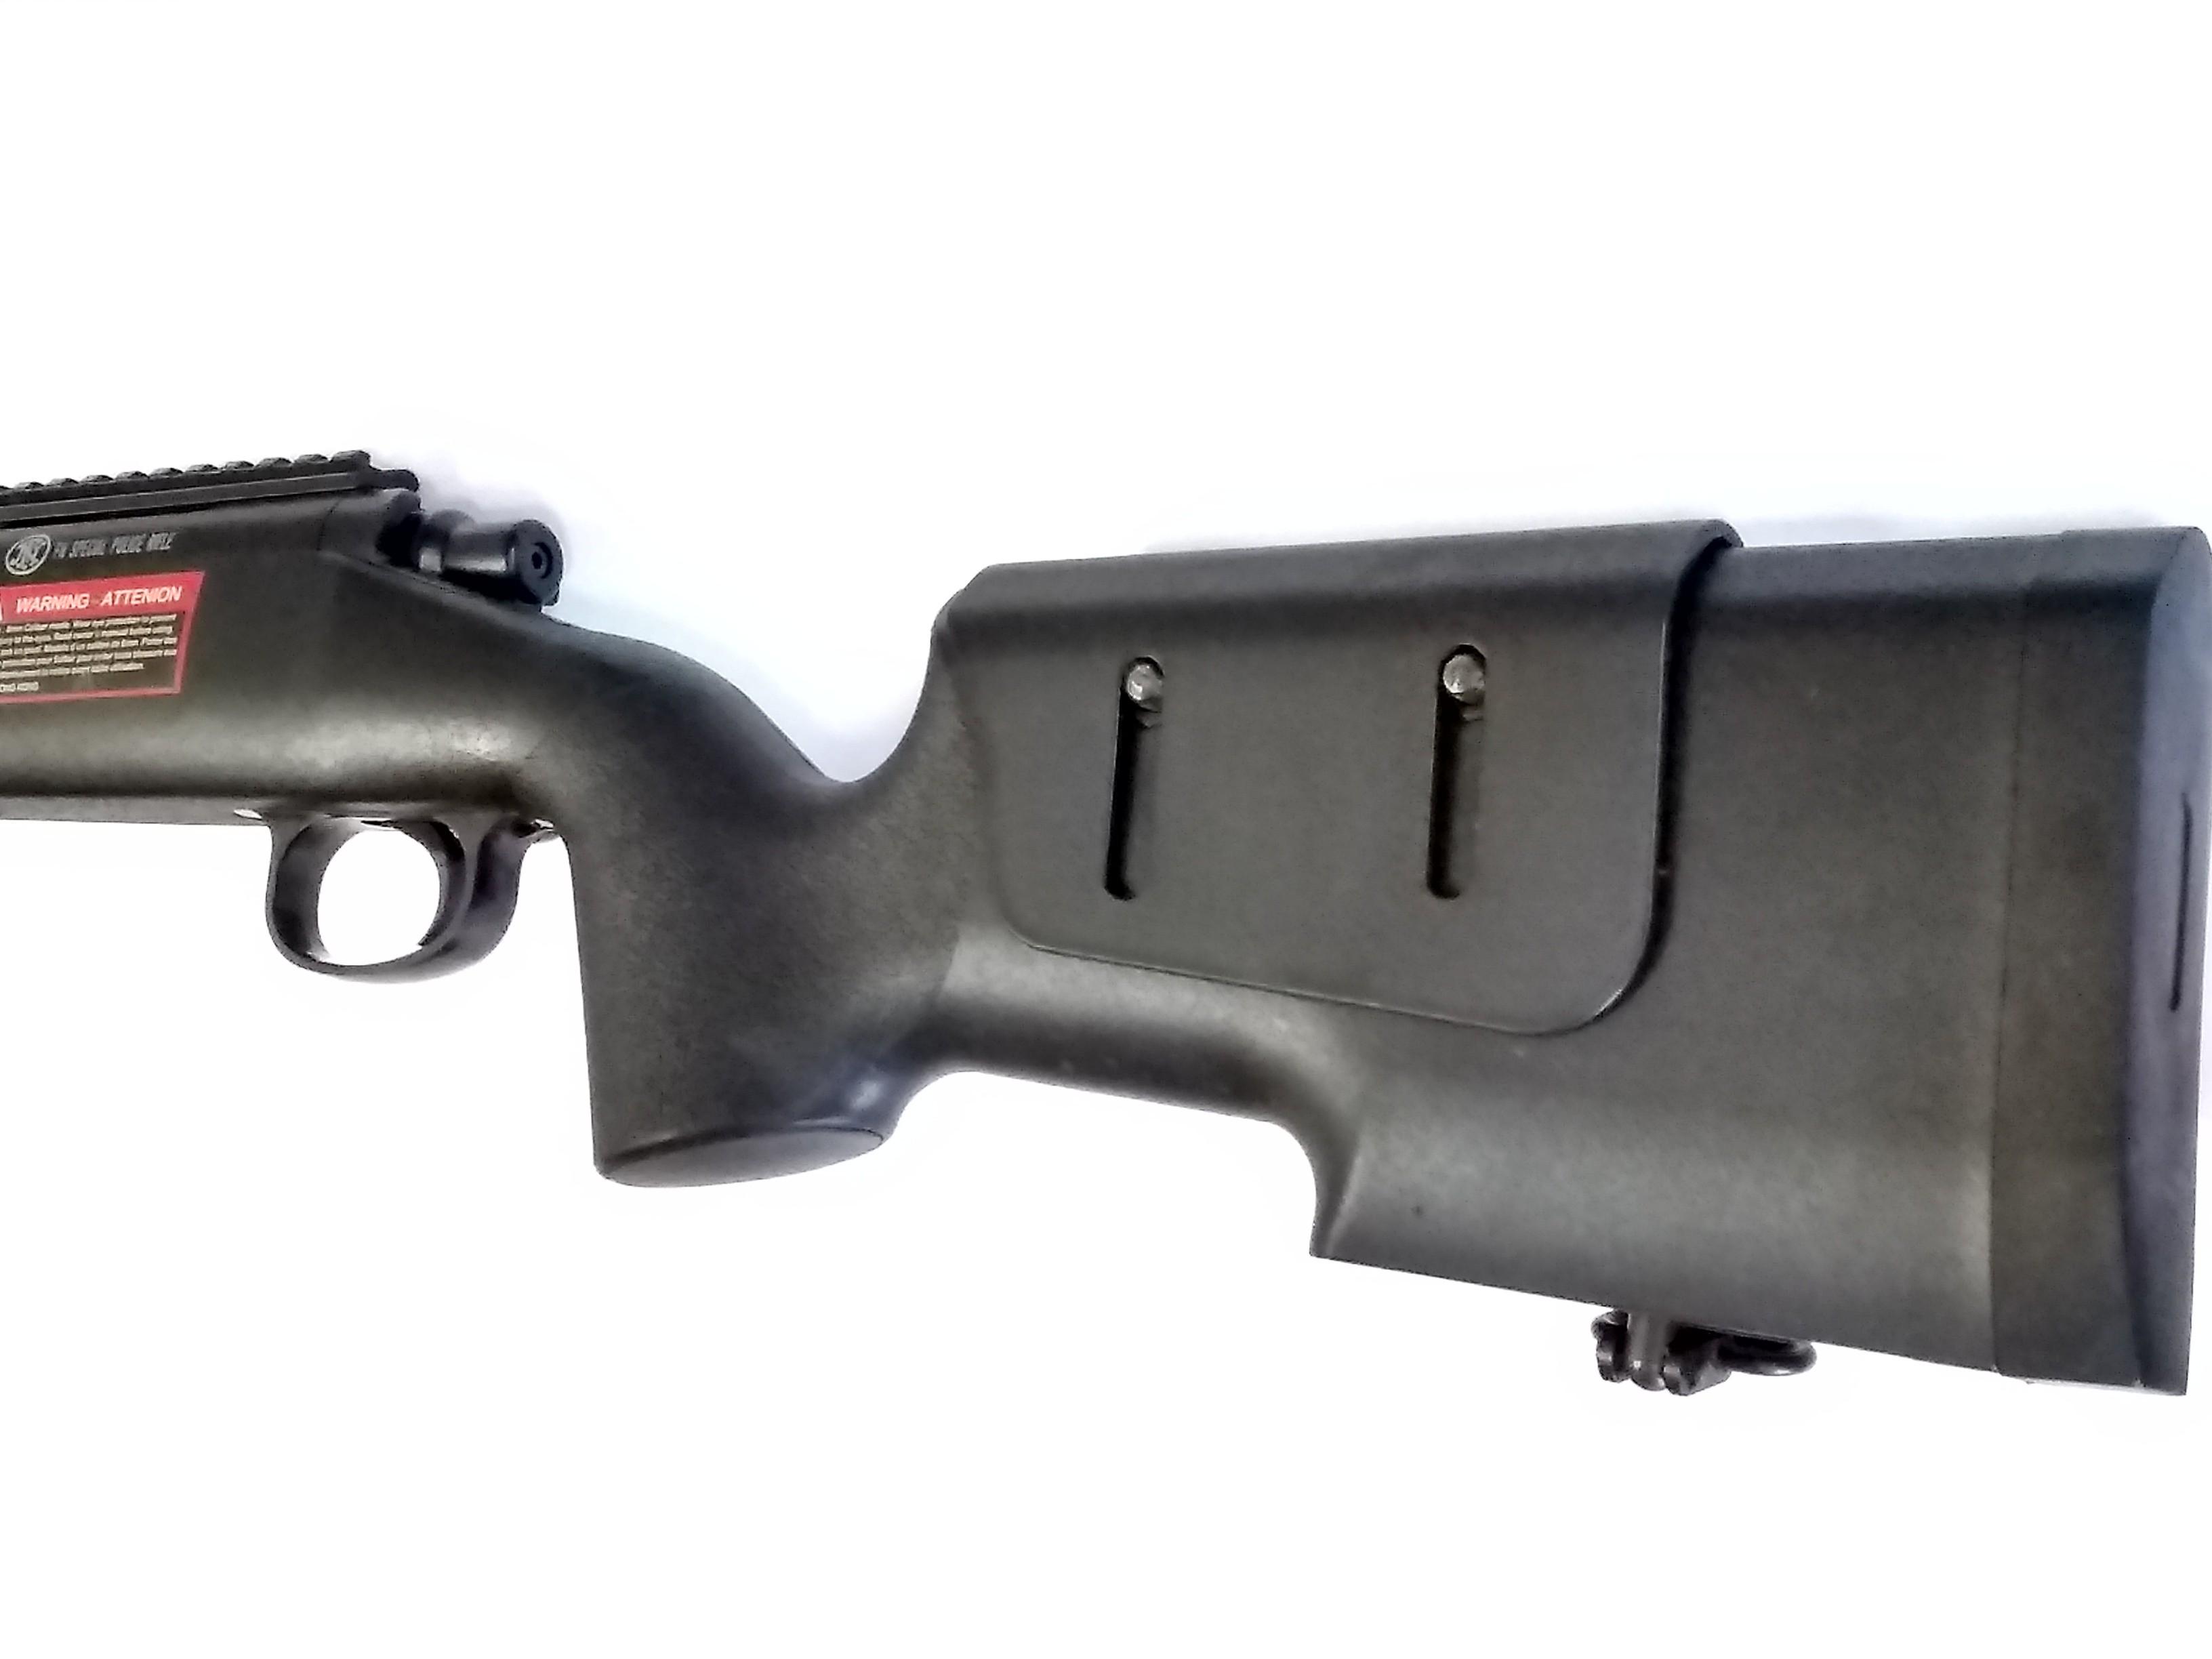 FN SPR A5M SPRING SNIPER